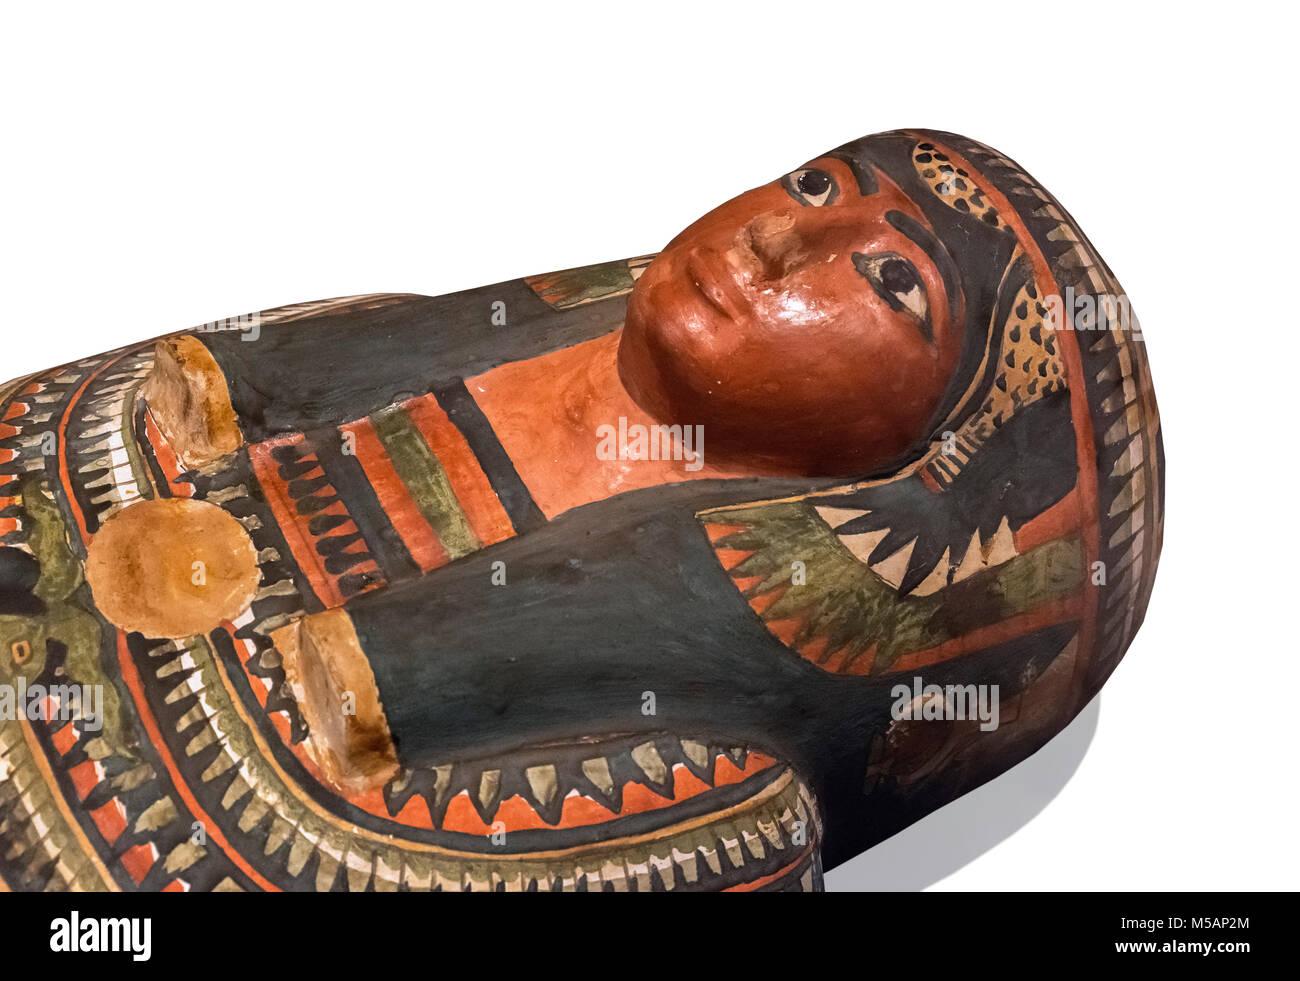 Egyptian Mummy of the Lady Meresamun, dating from around 830-715 BC, Ashmolean Museum, Oxford, England, UK - Stock Image